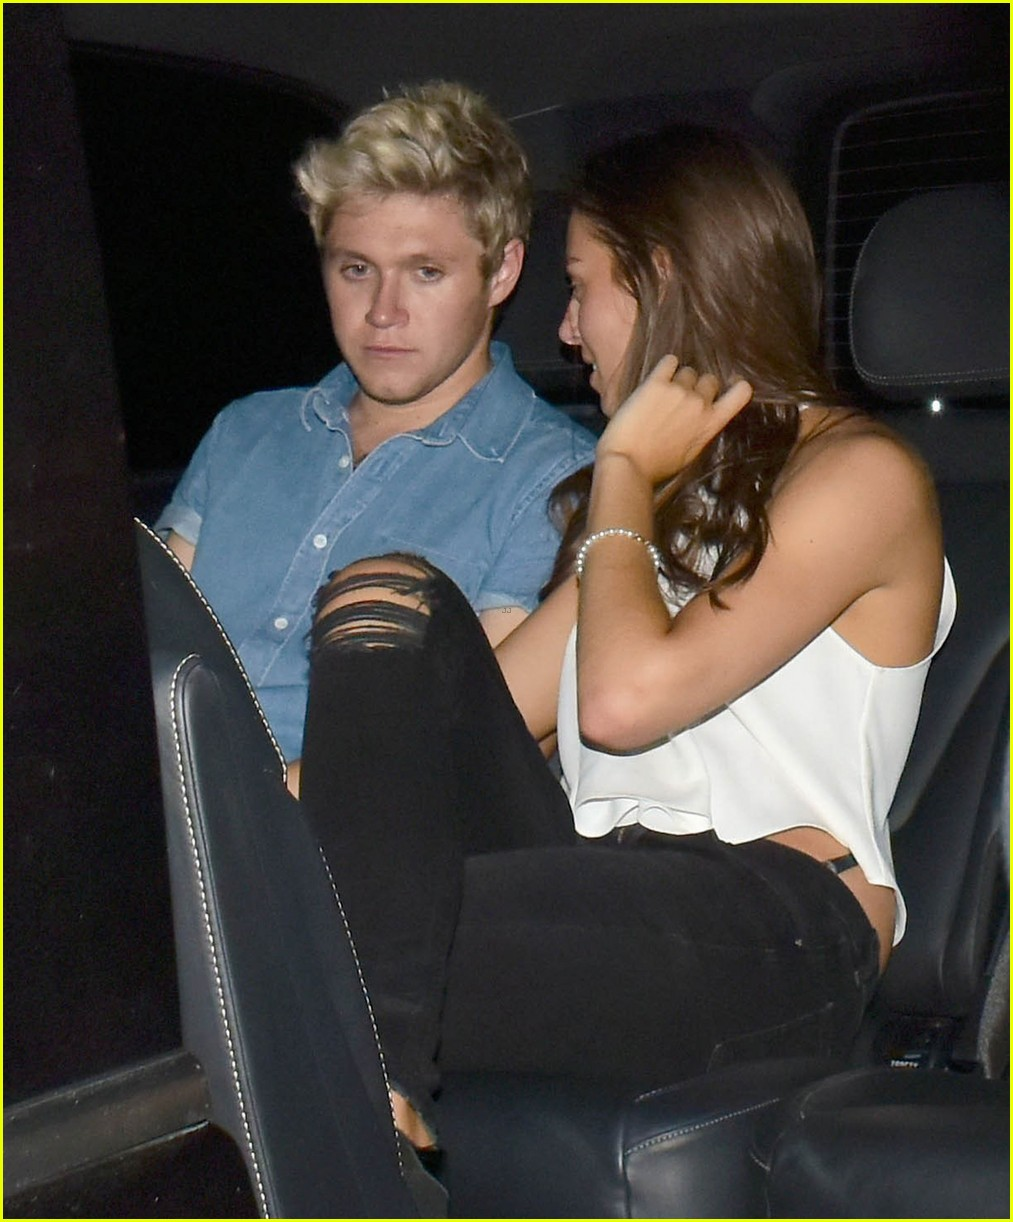 64a2647a0efc Niall Horan Flaunts PDA with New Girlfriend Celine Helene Vandycke ...